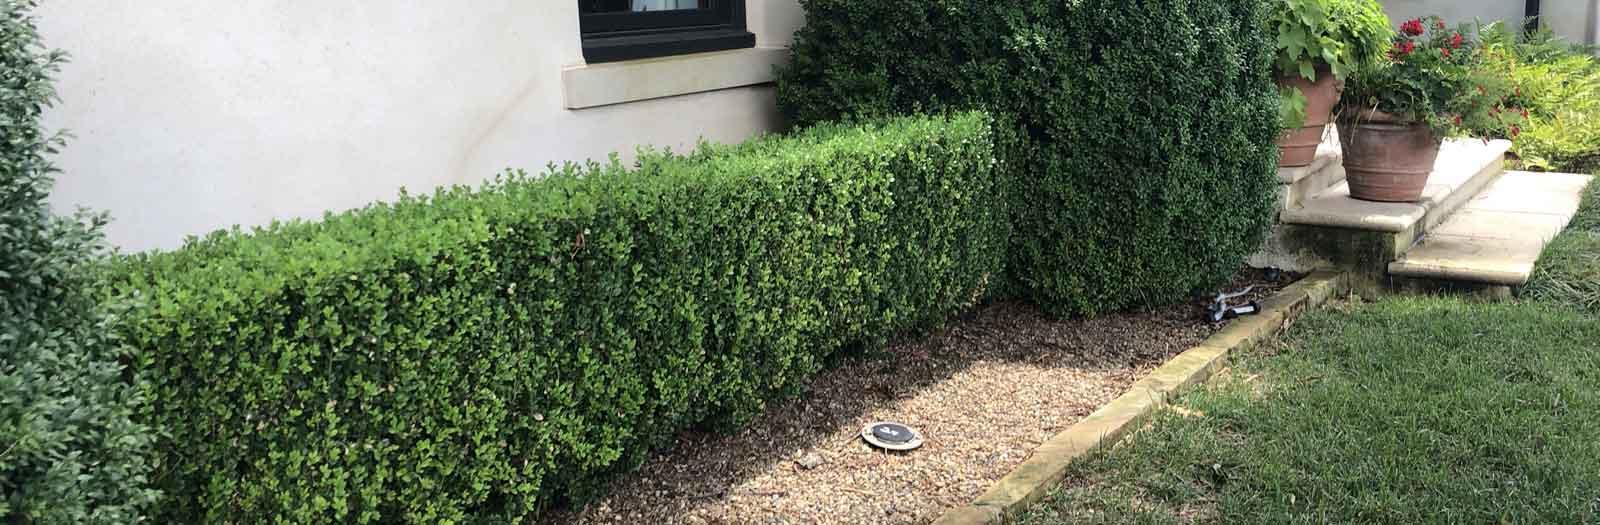 boxwood shrubs